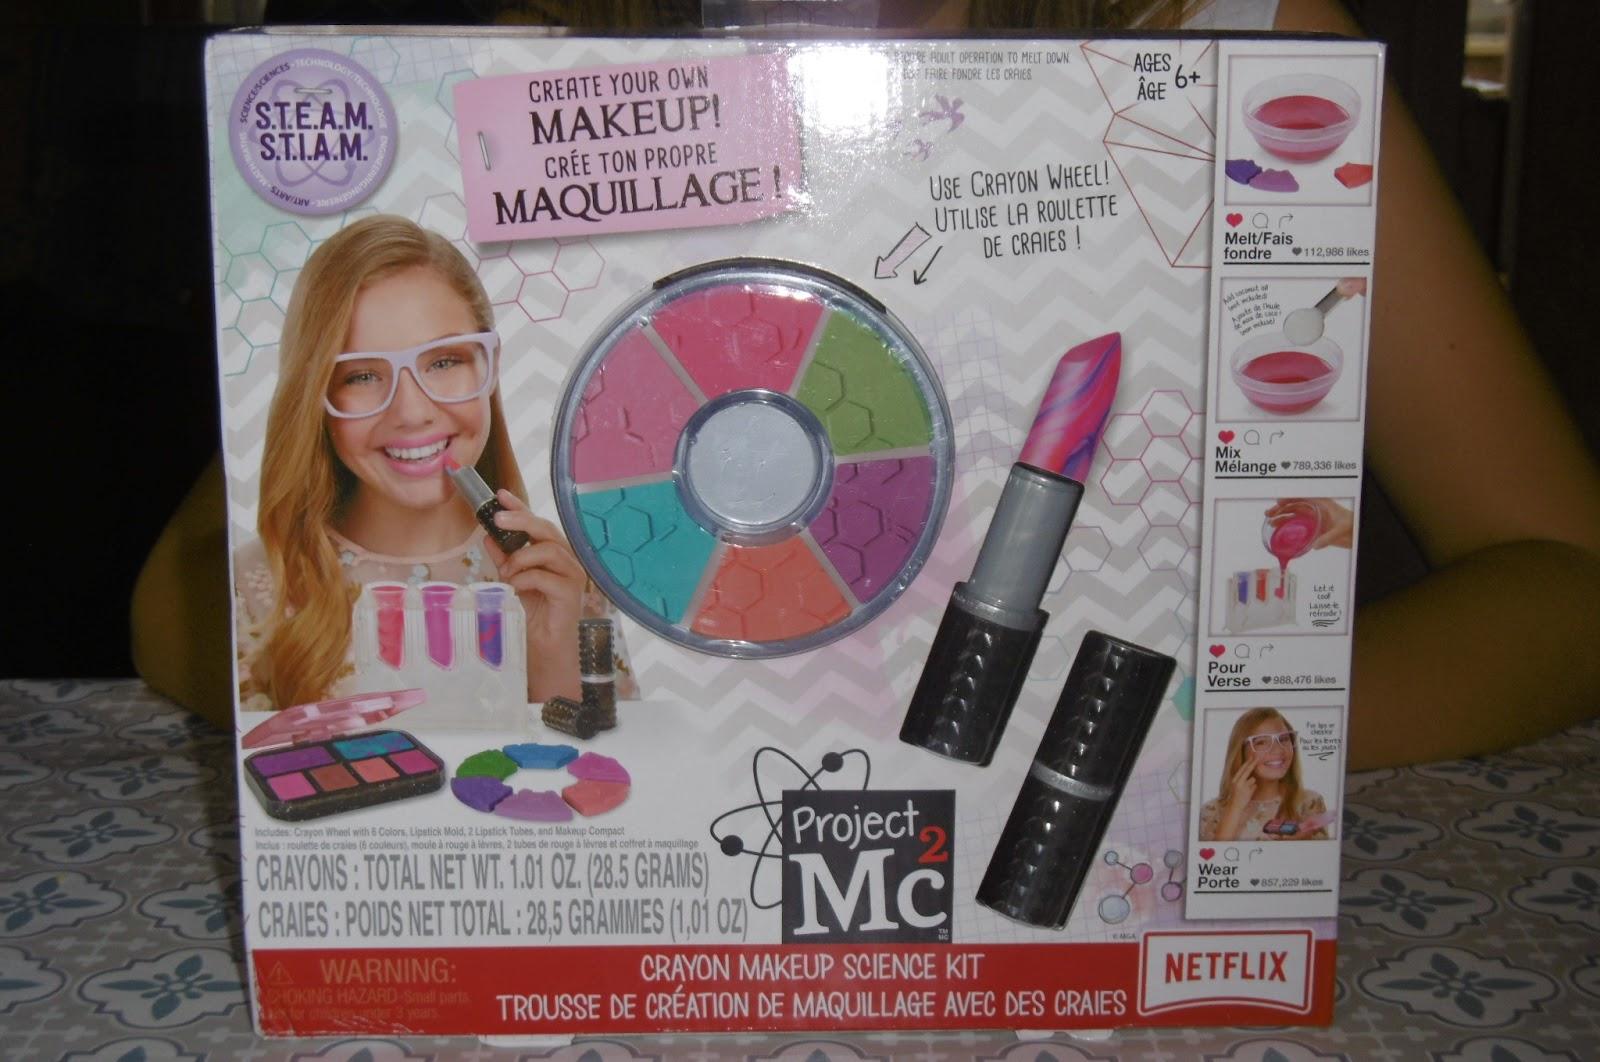 Superhero Elastic Stretch Volumizing Mascara by IT Cosmetics #18